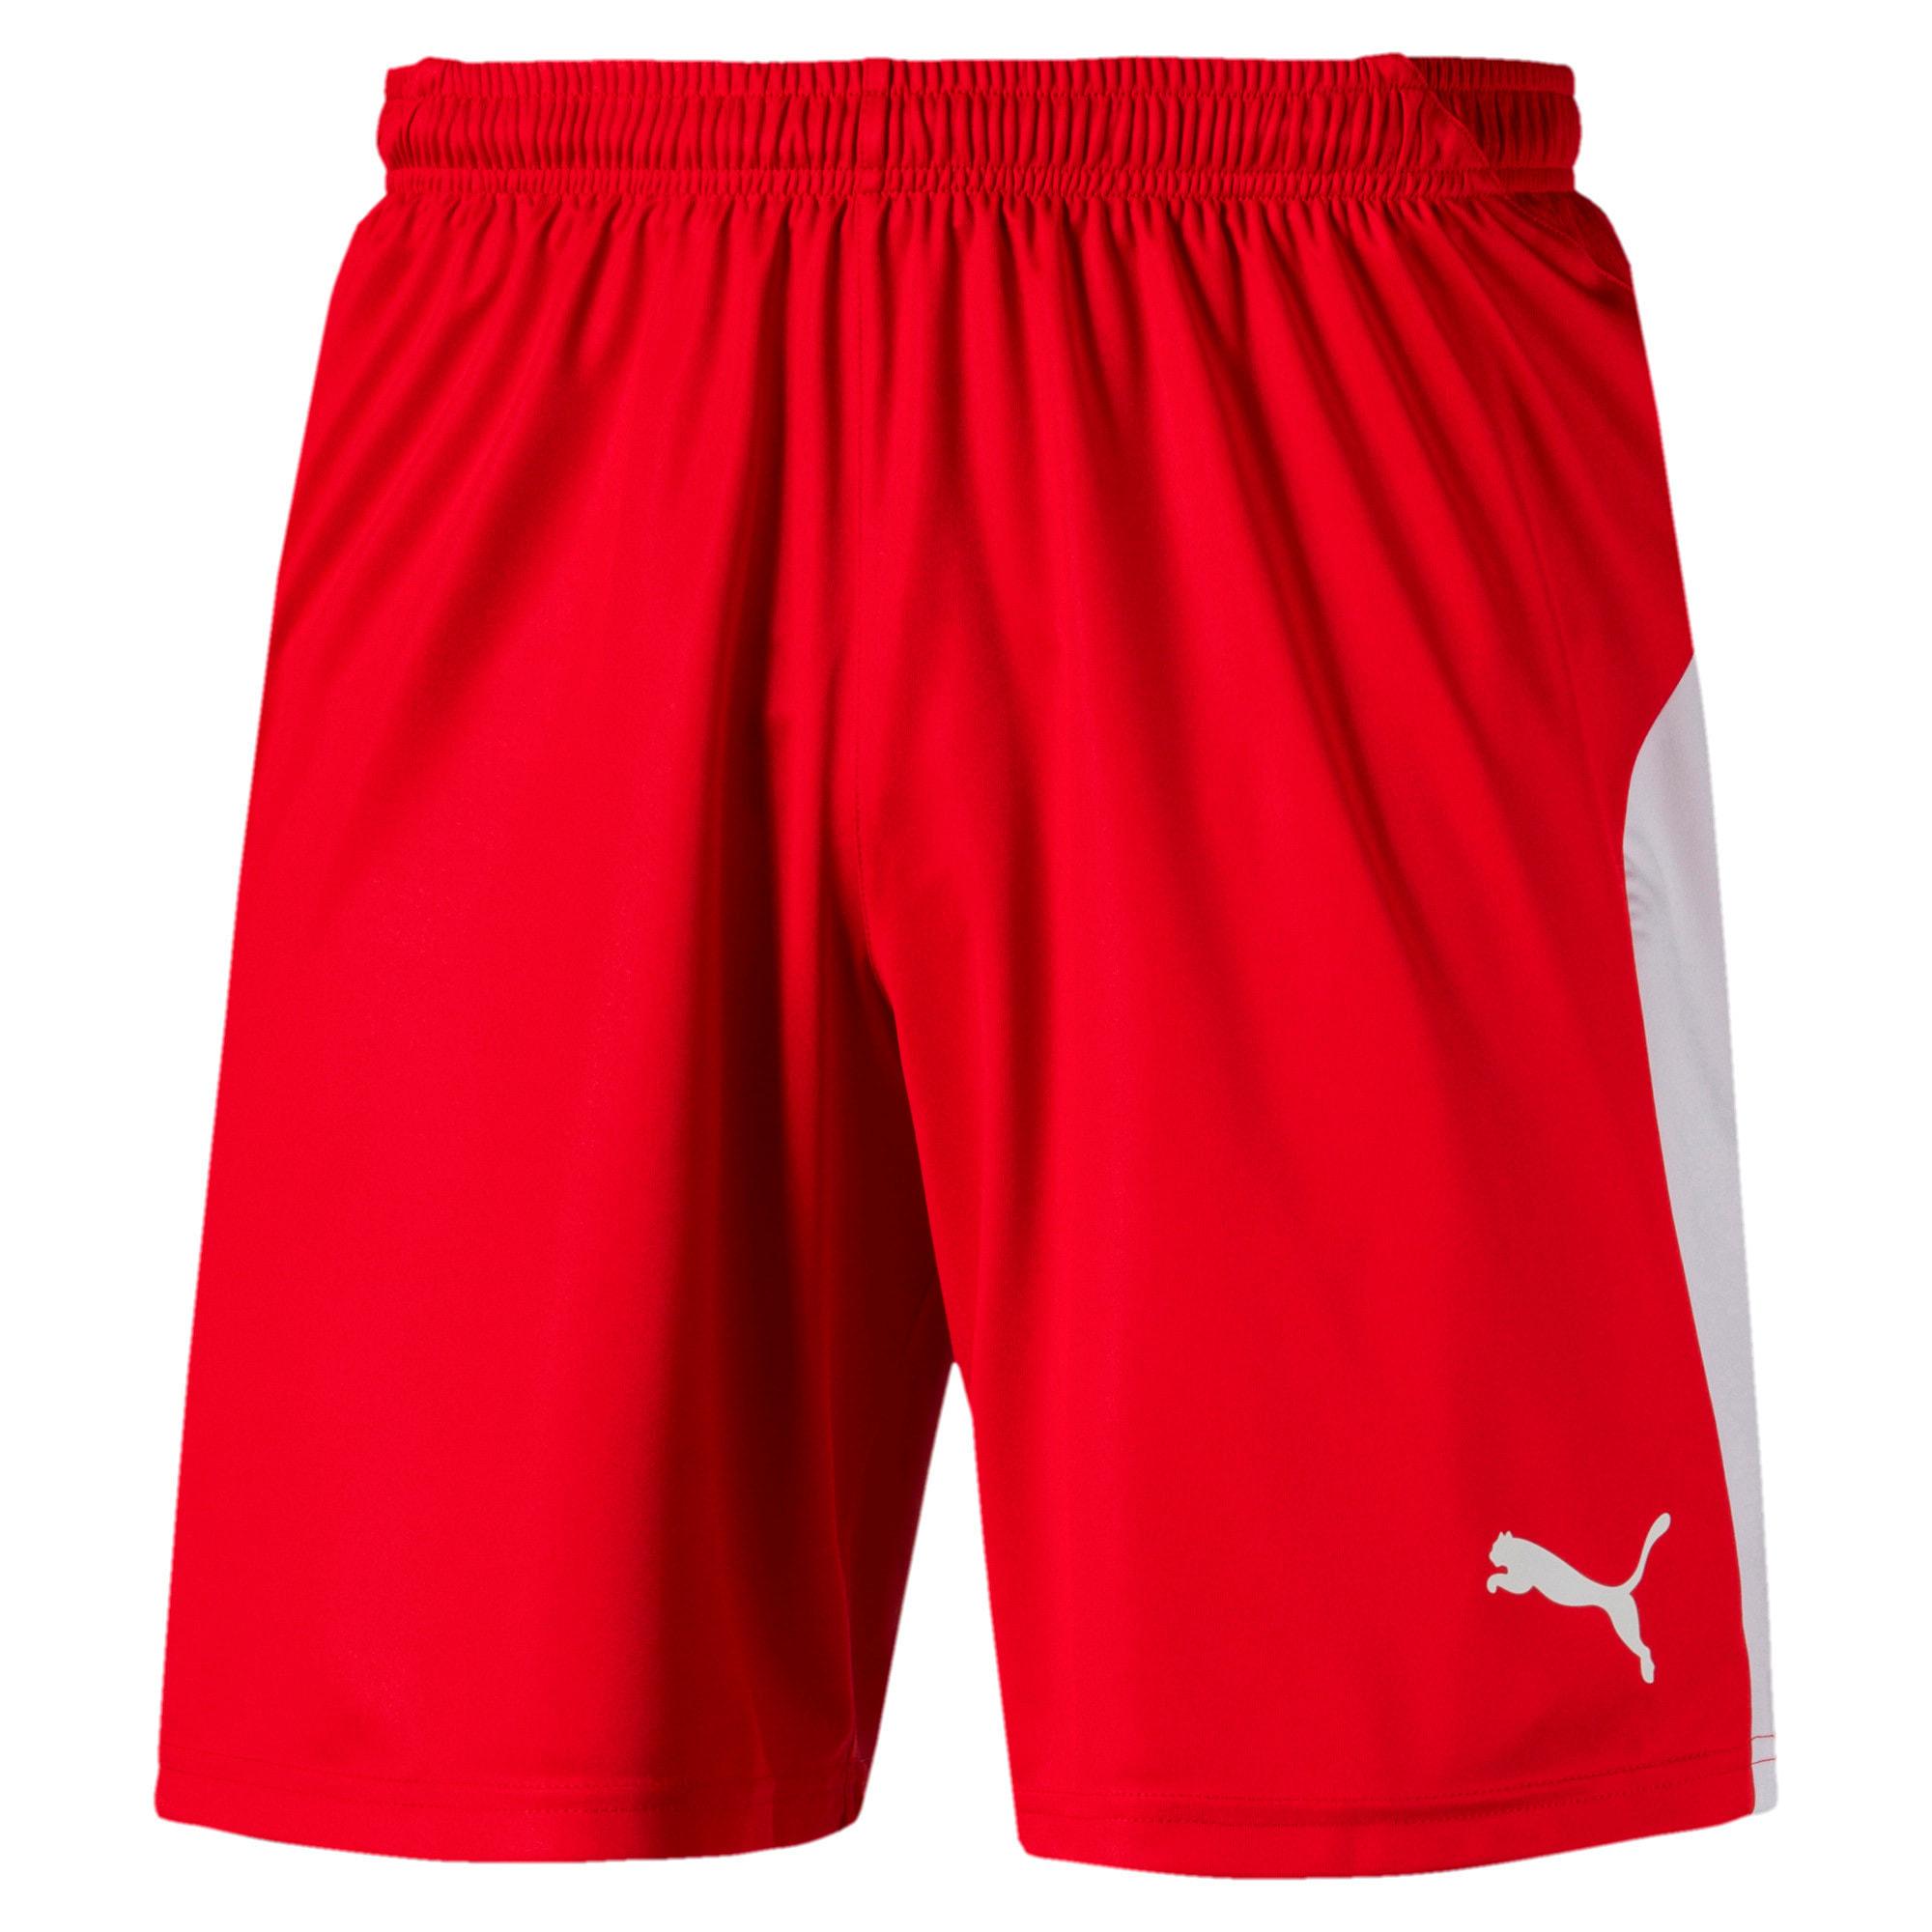 Thumbnail 1 of LIGA Men's Shorts, Puma Red-Puma White, medium